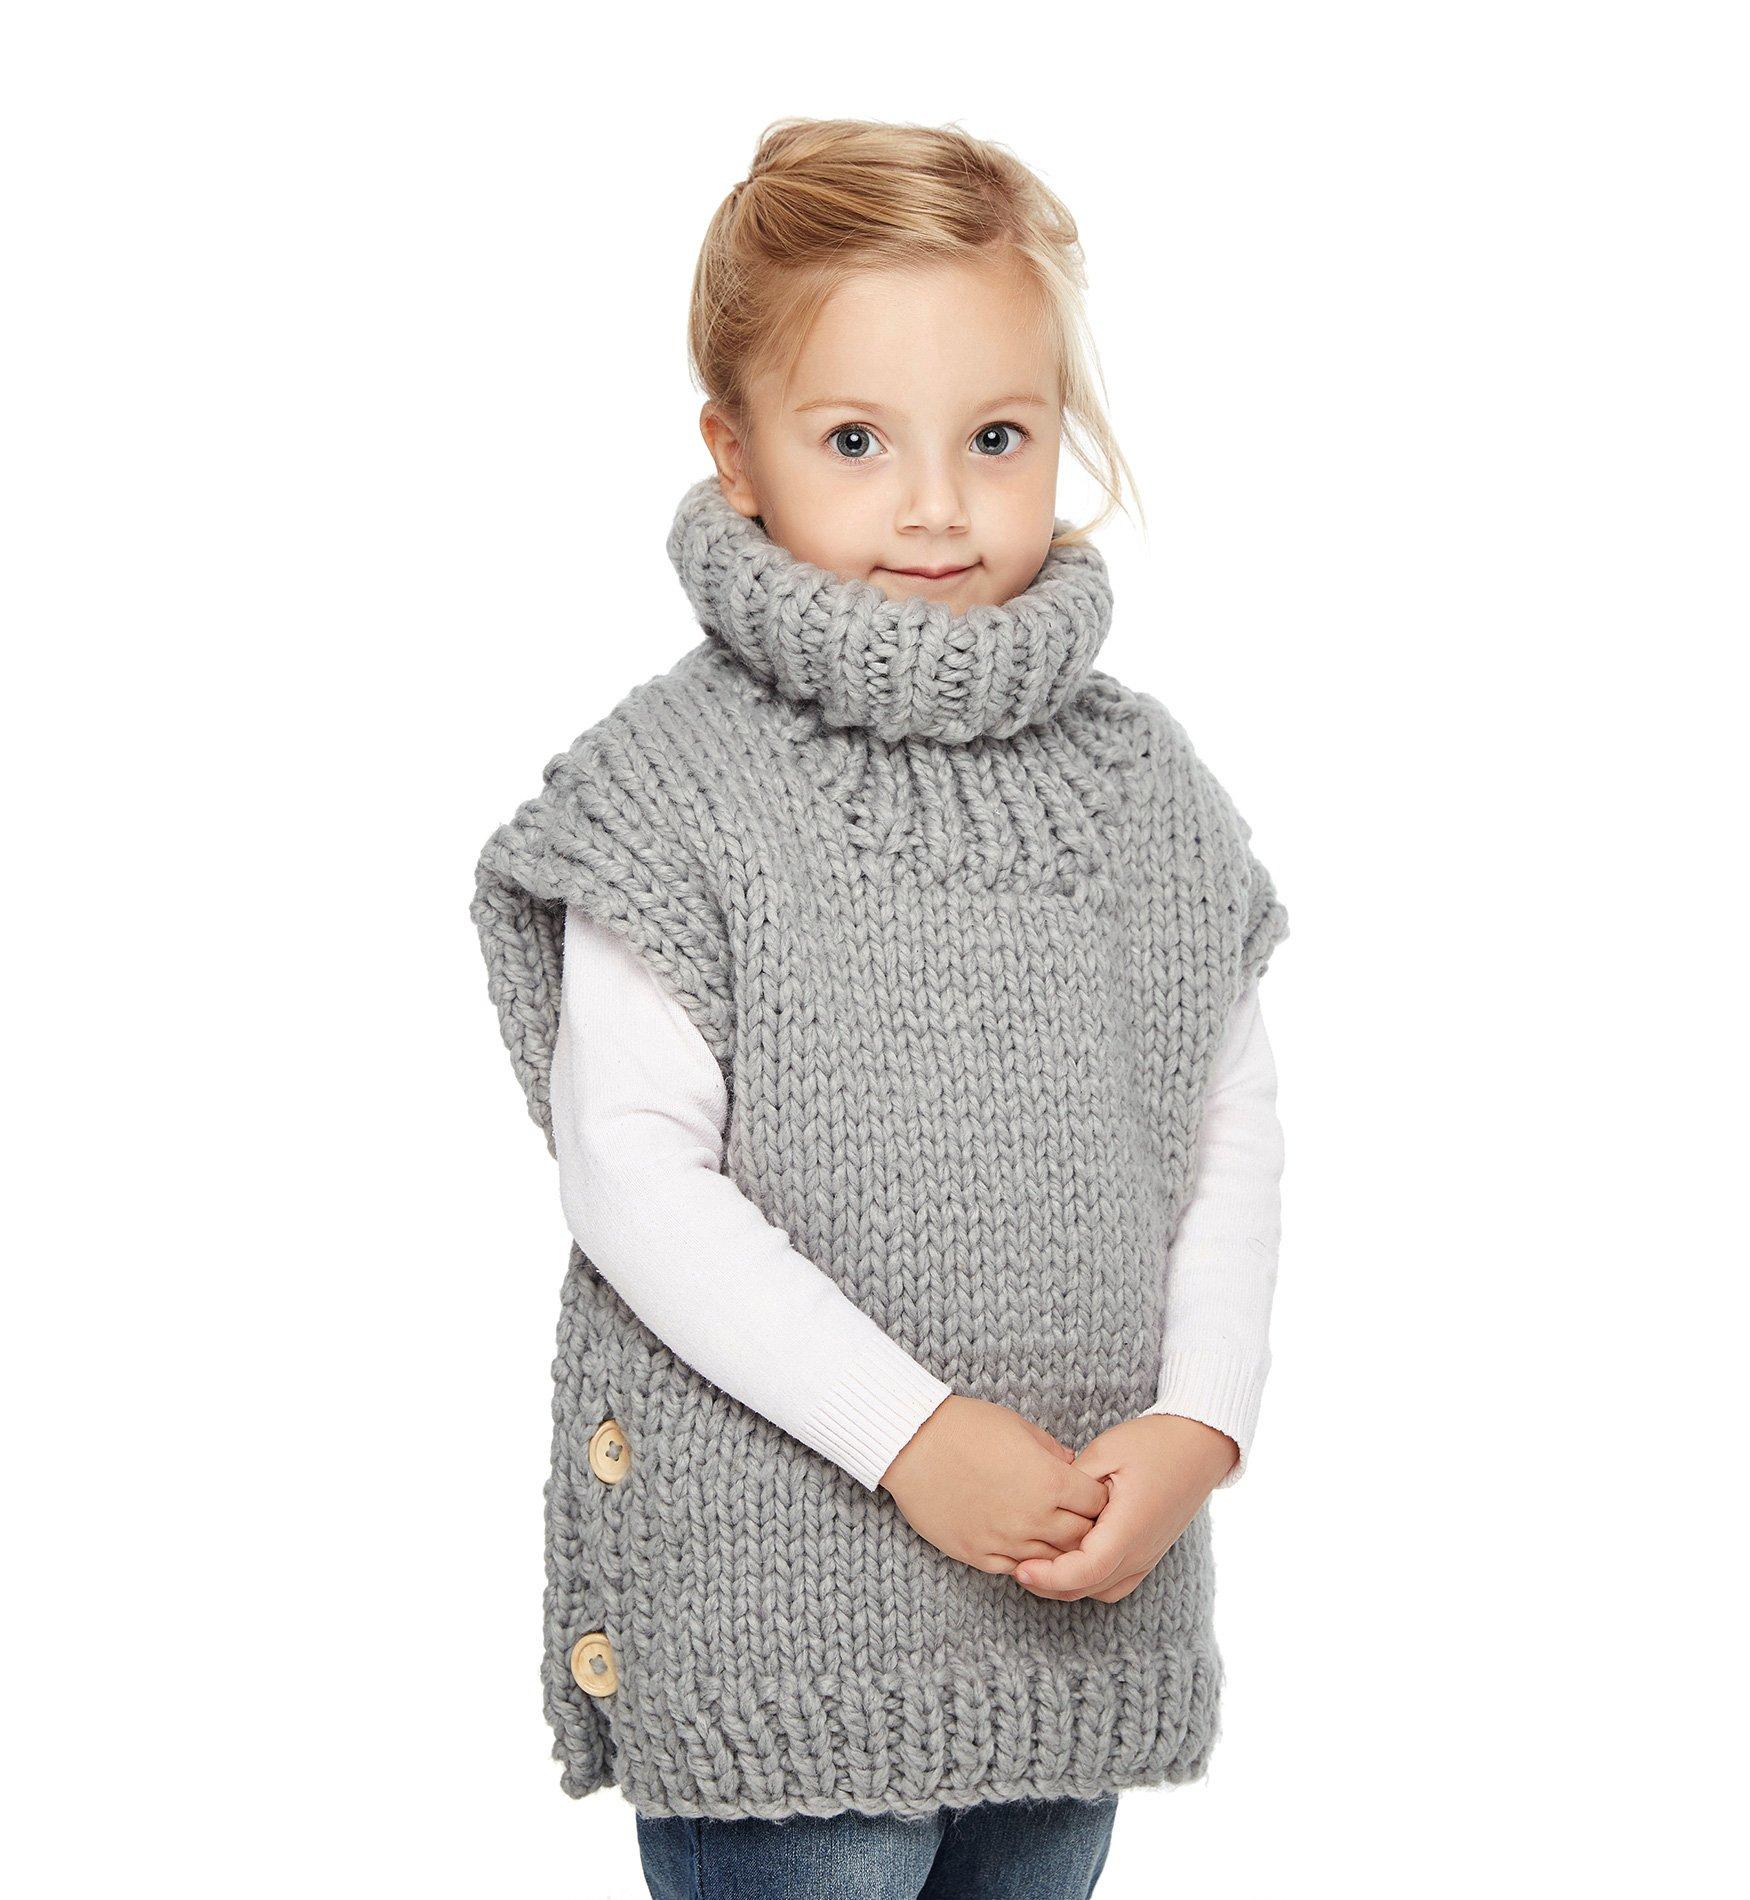 Sumolux Kids Girls Knit Turtleneck Sweater Jumper Vest Sleeveless Cardigan Thick Warm for Autumn Winter